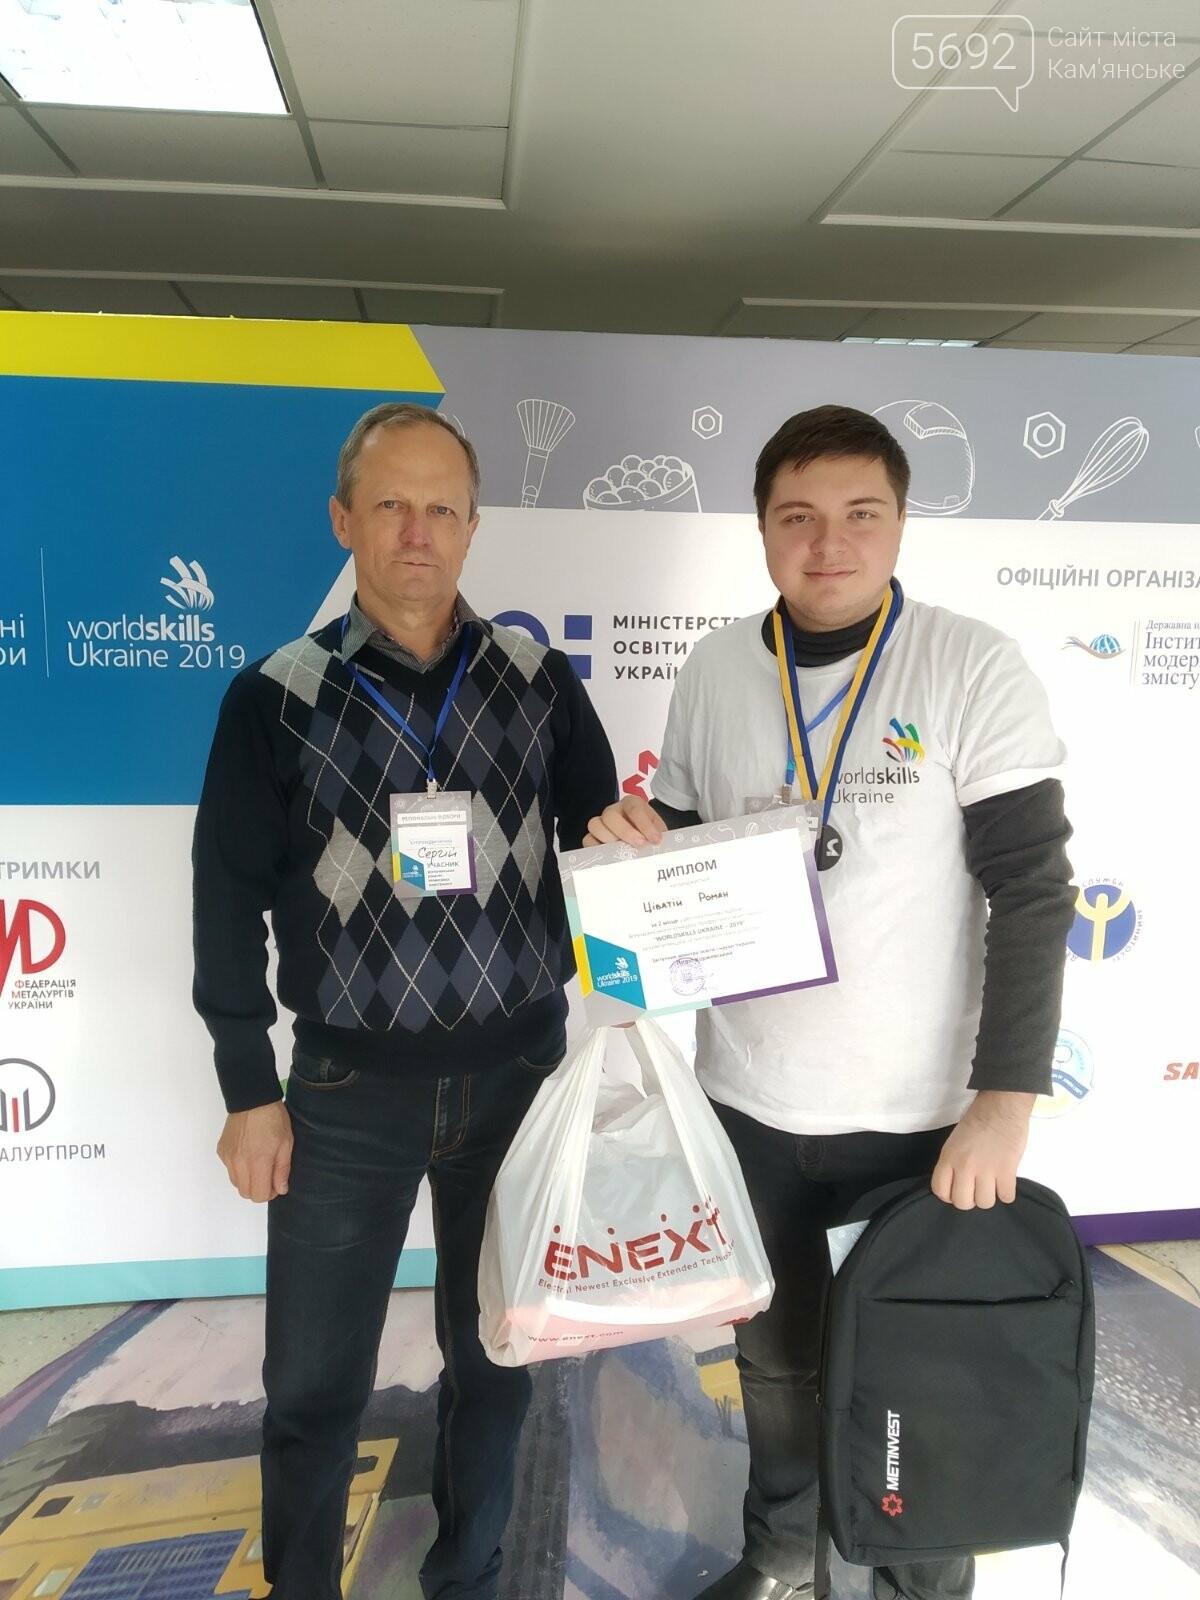 Каменчане победили в региональном этапе WorldSkills Ukraine, фото-7